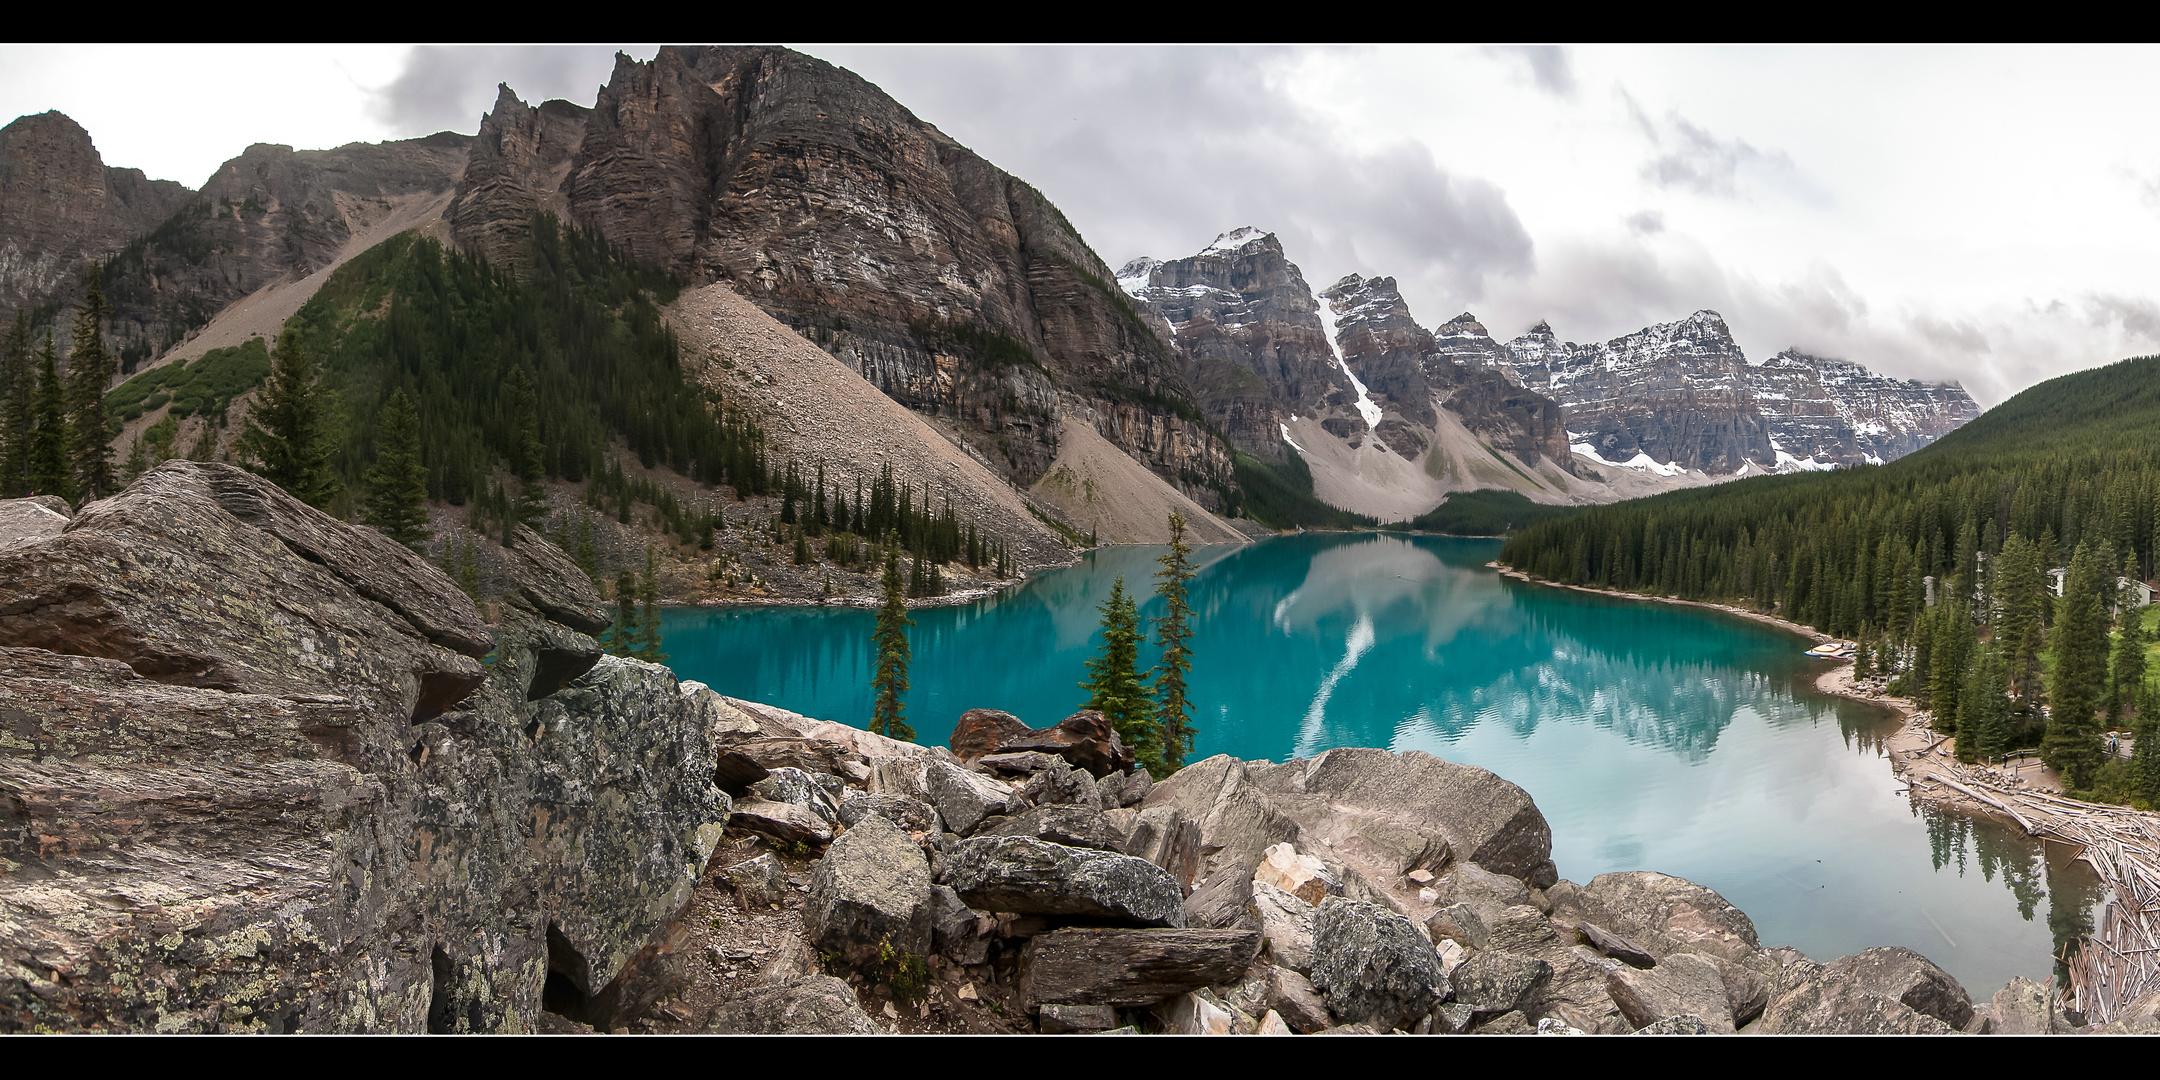 Moraine Lake - Canada